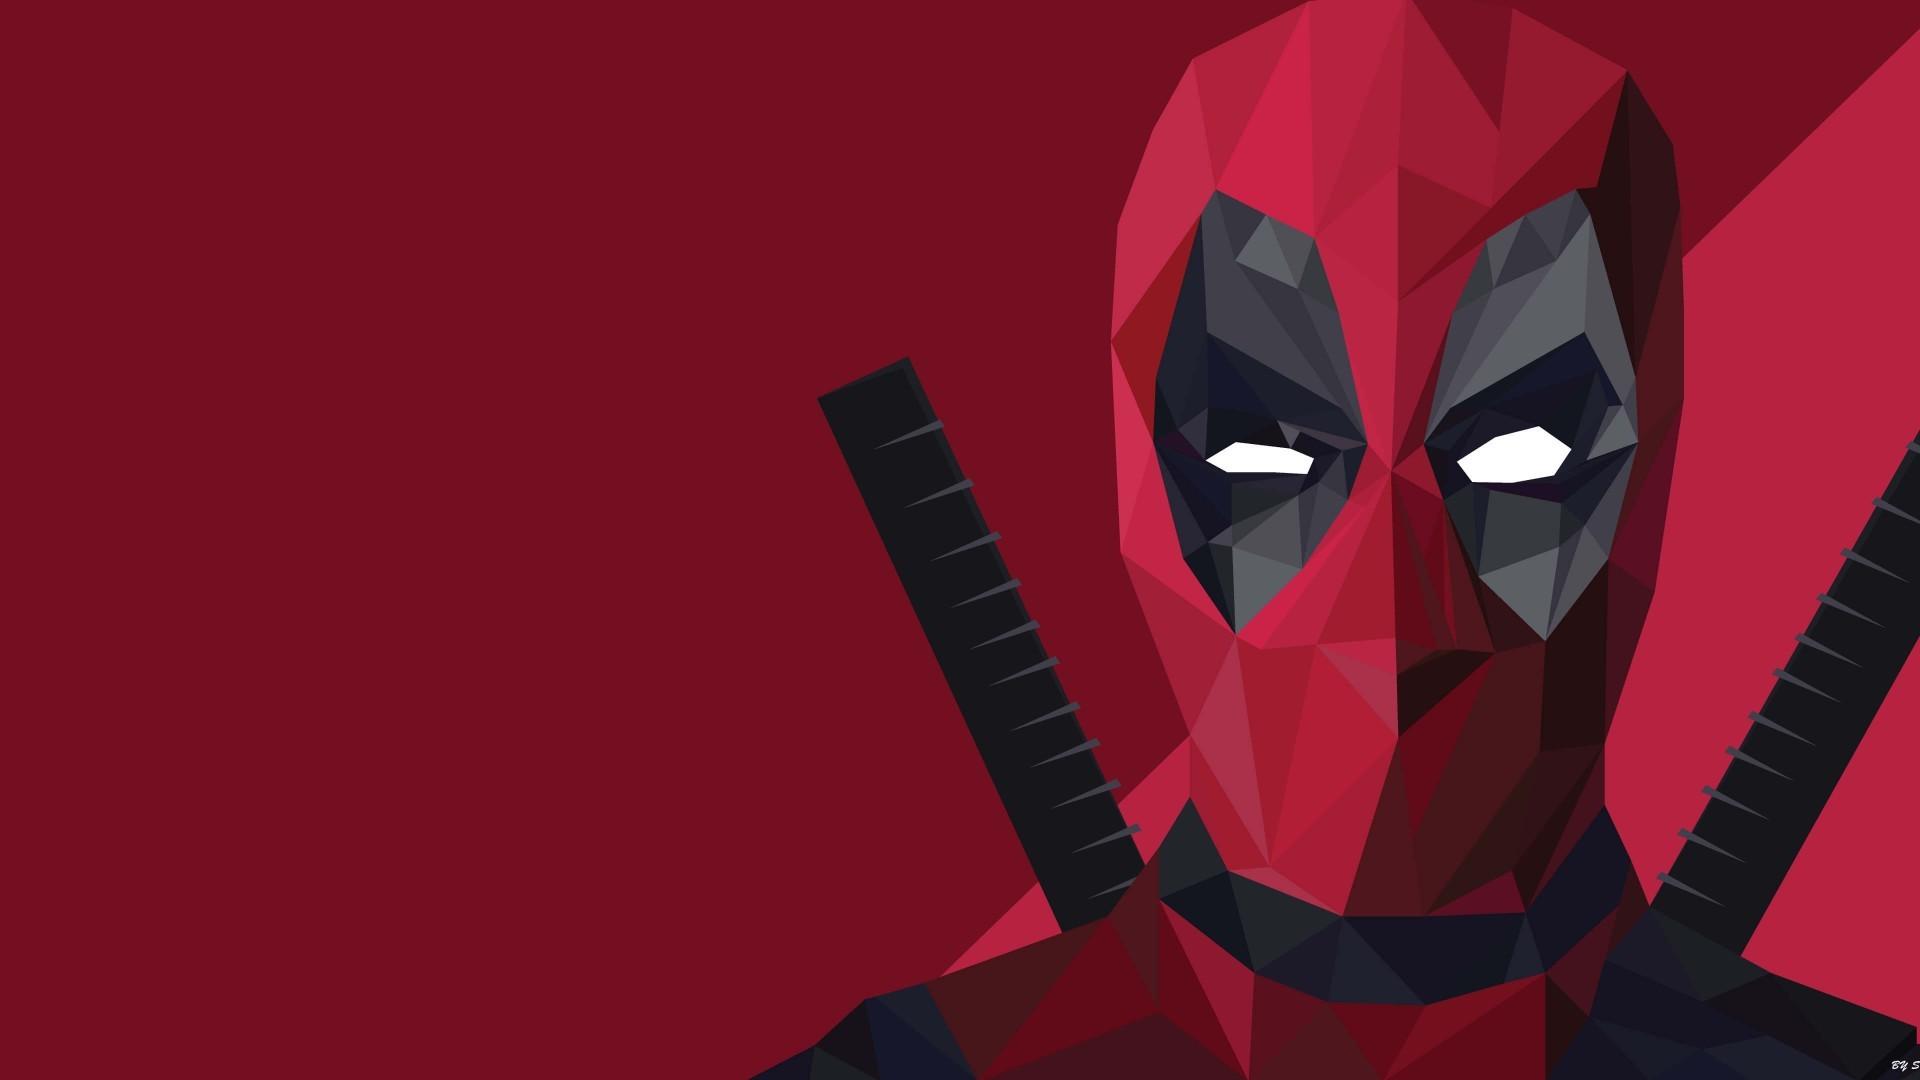 Deadpool Wallpaper 1920x1080 ·① Download Free Stunning HD